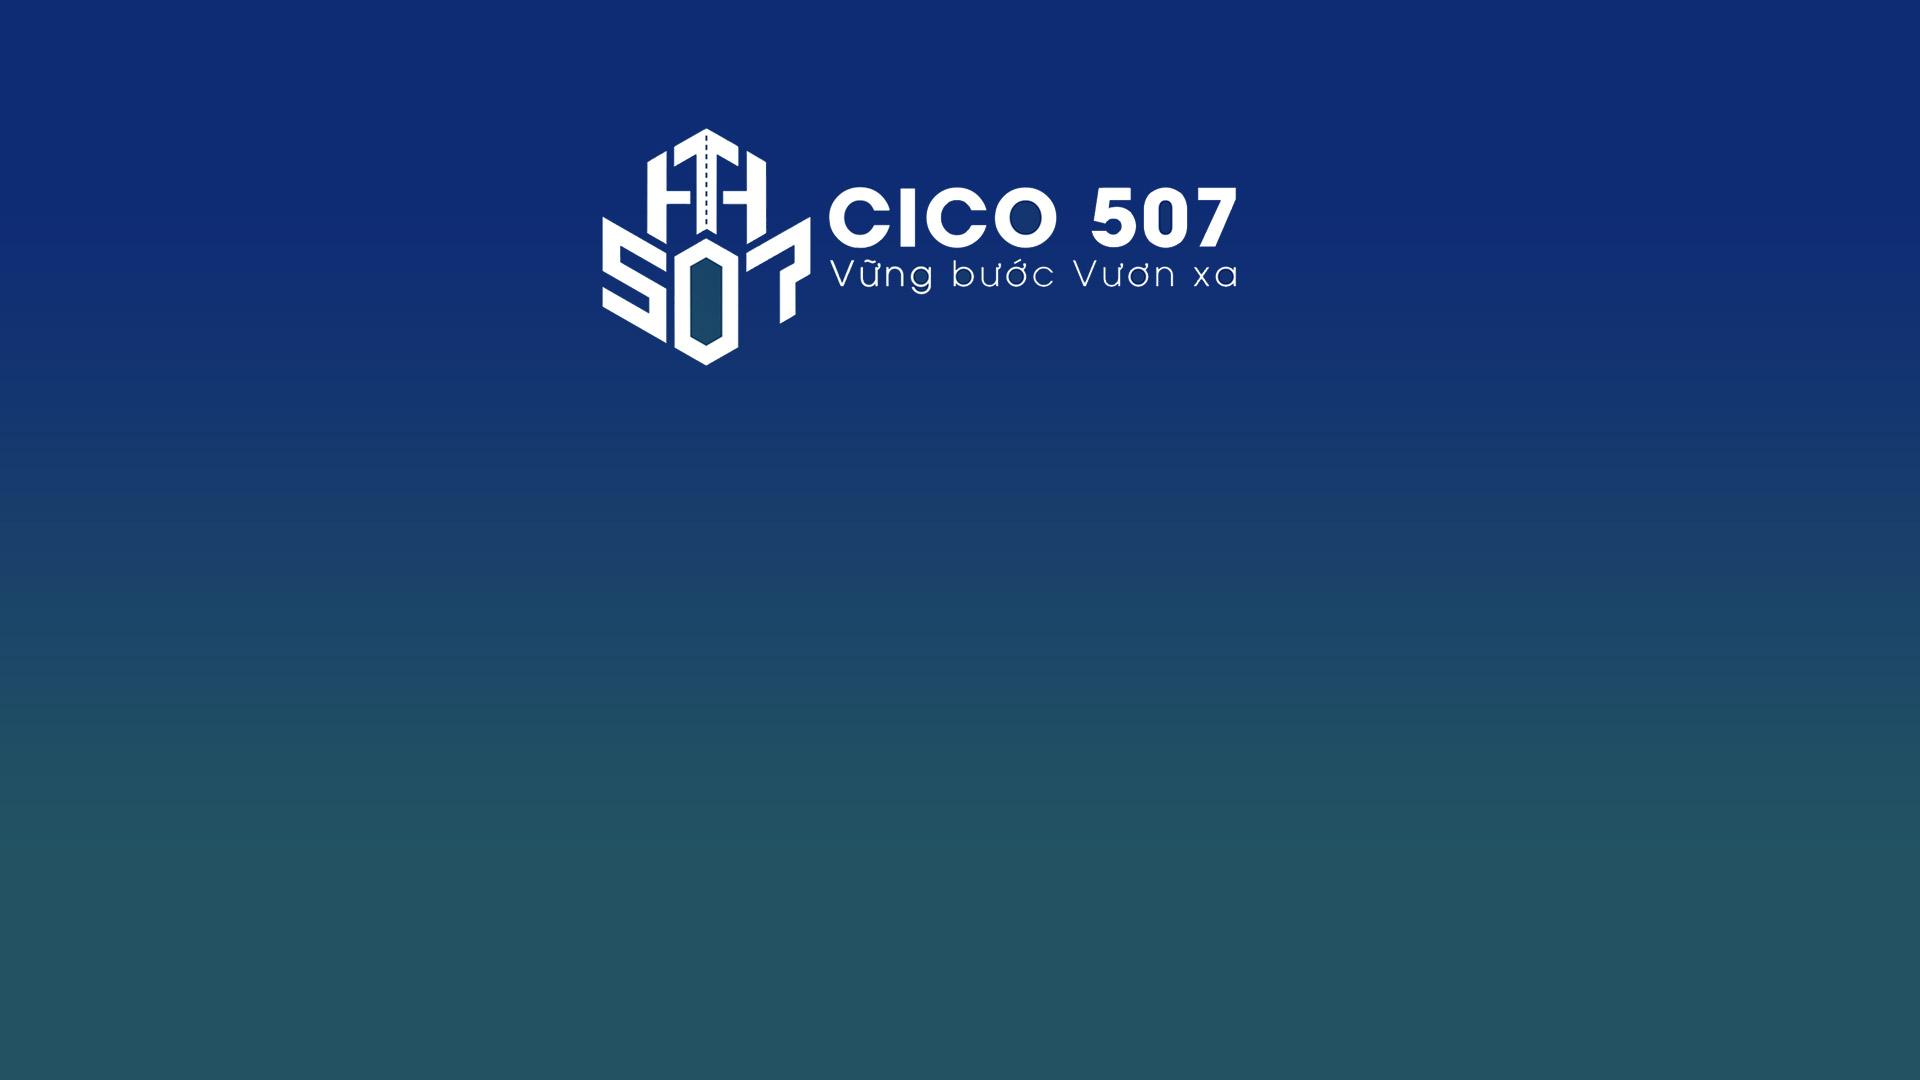 Cico 507